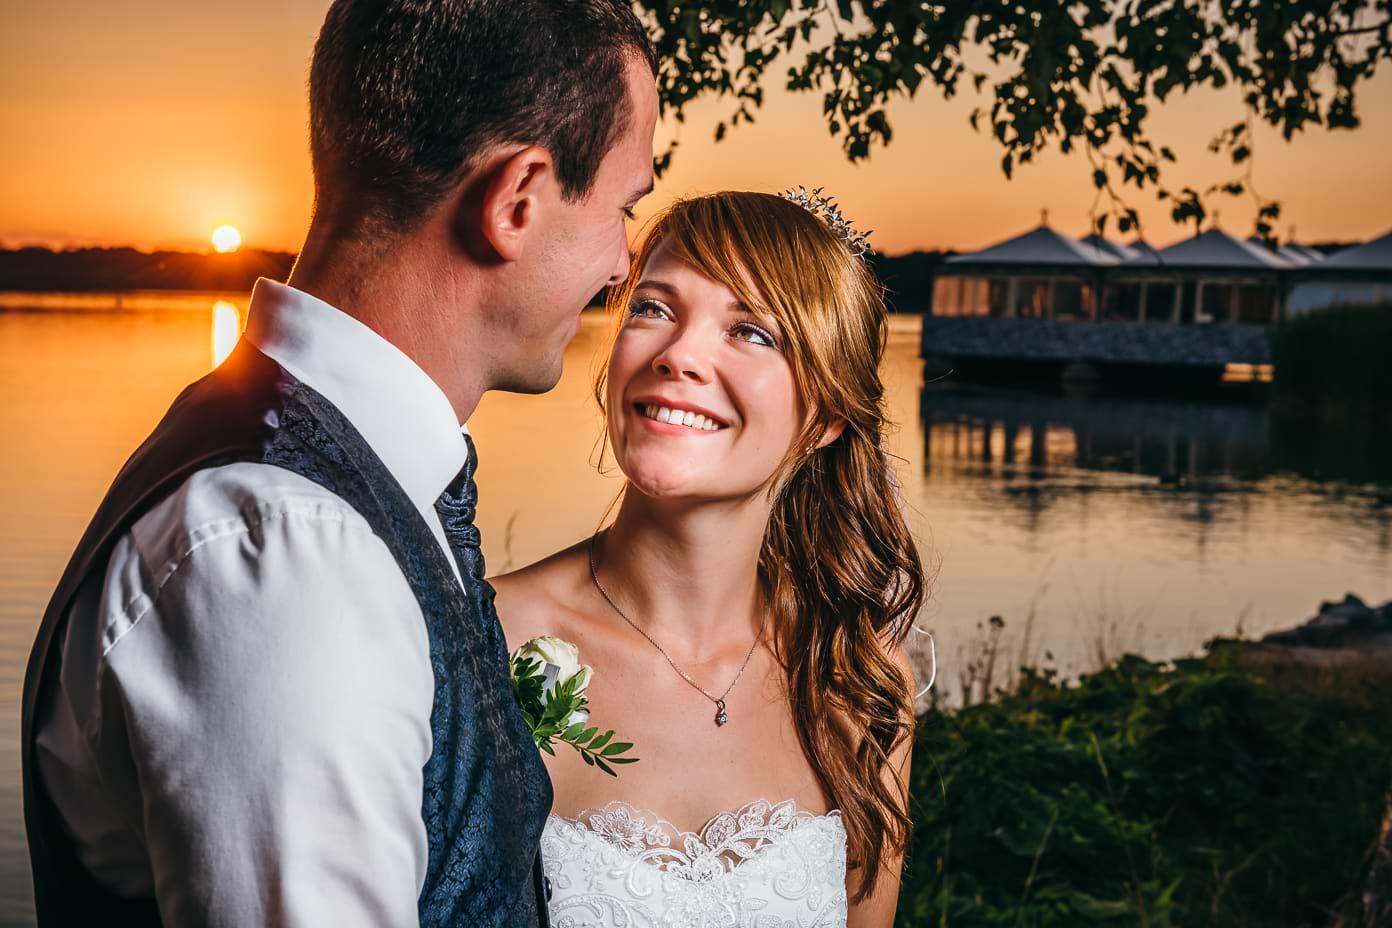 Brautpaar im Sonnenuntergang am Rangsdorfer See